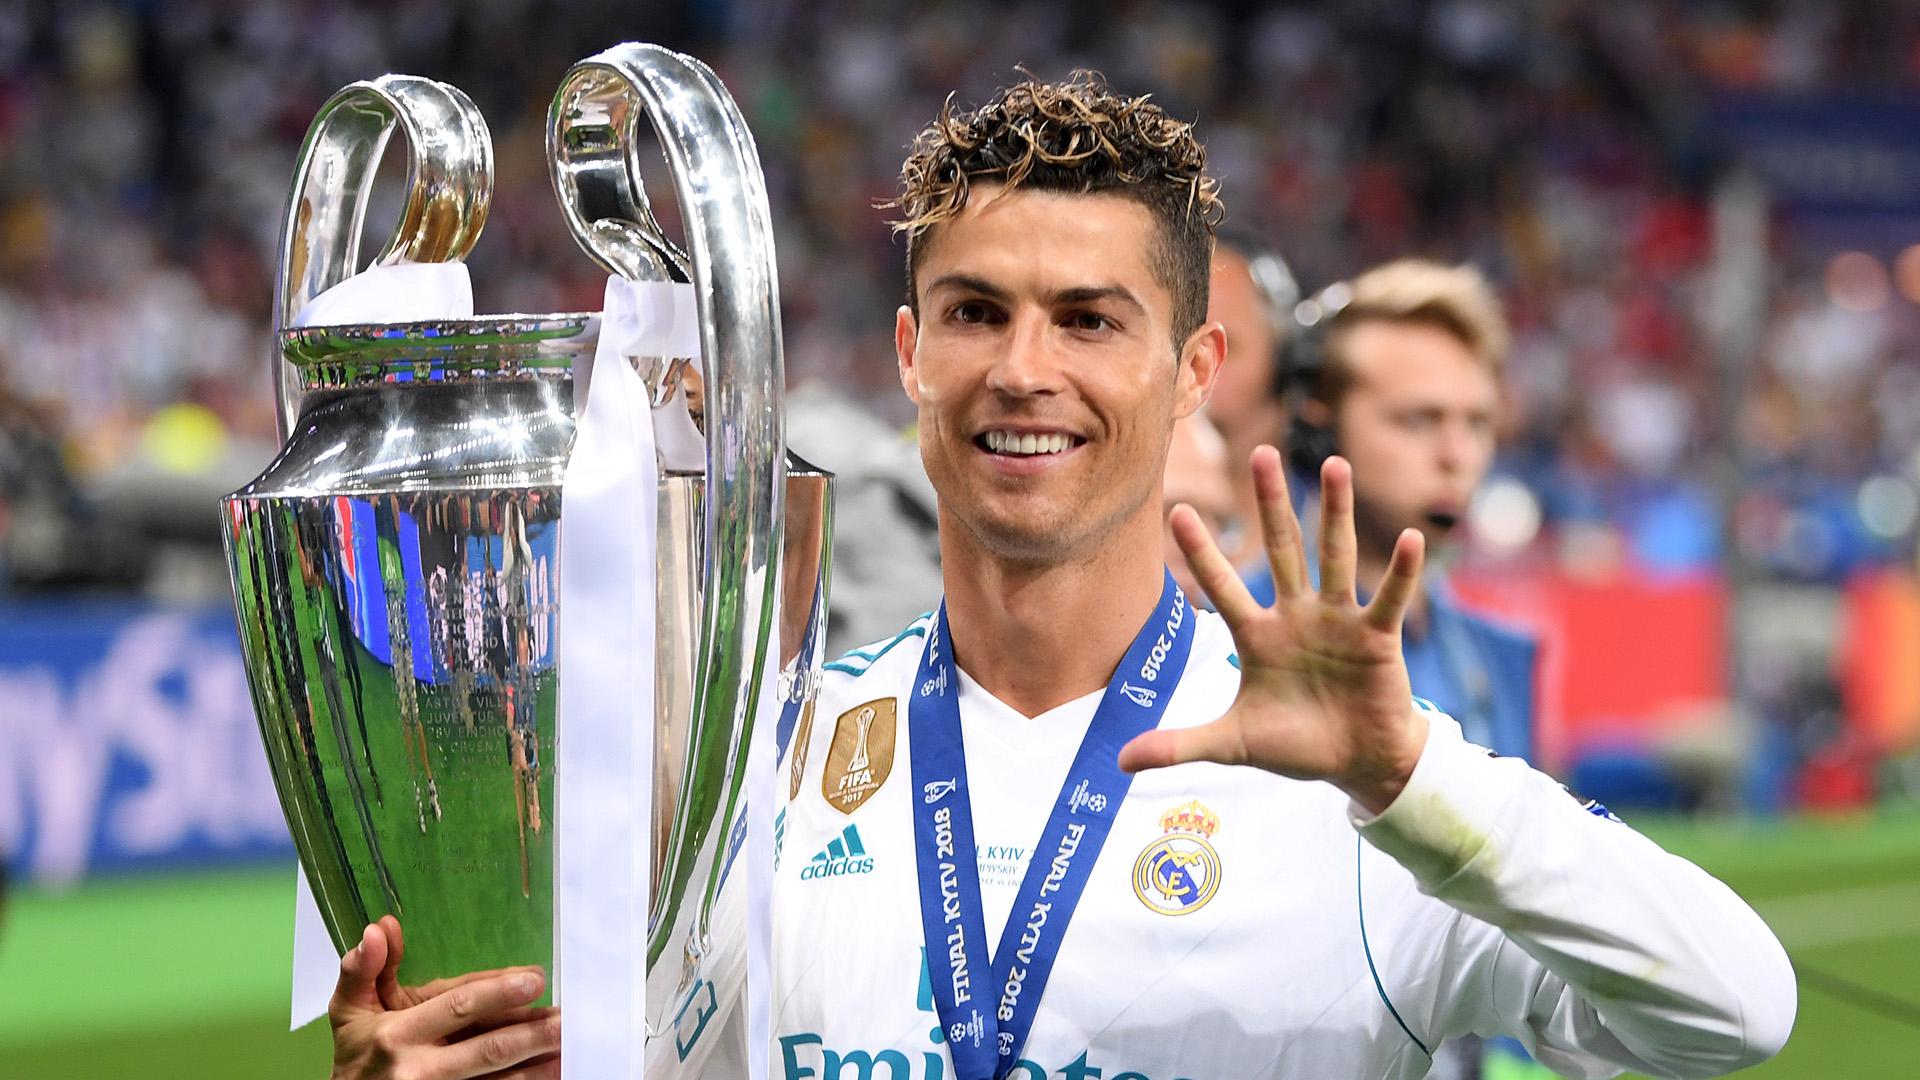 cristiano-ronaldo-real-madrid-champions-league-final-260518_14l4mylhaxcjs1mljwj7aogxaz.jpg